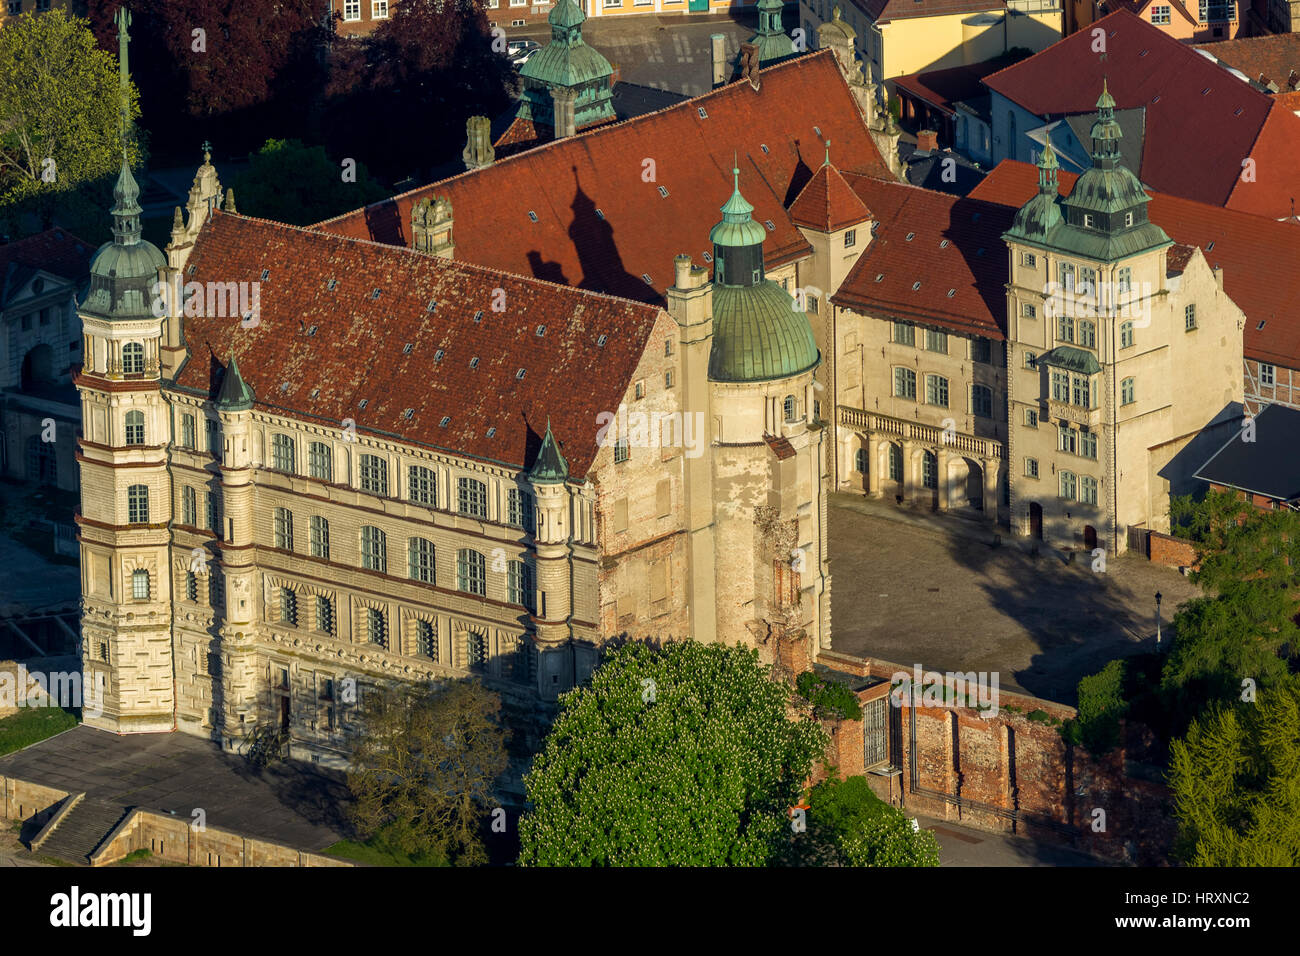 Schwerin Castle, Mecklenburg Vorpommern, Germany Stock Photo ...